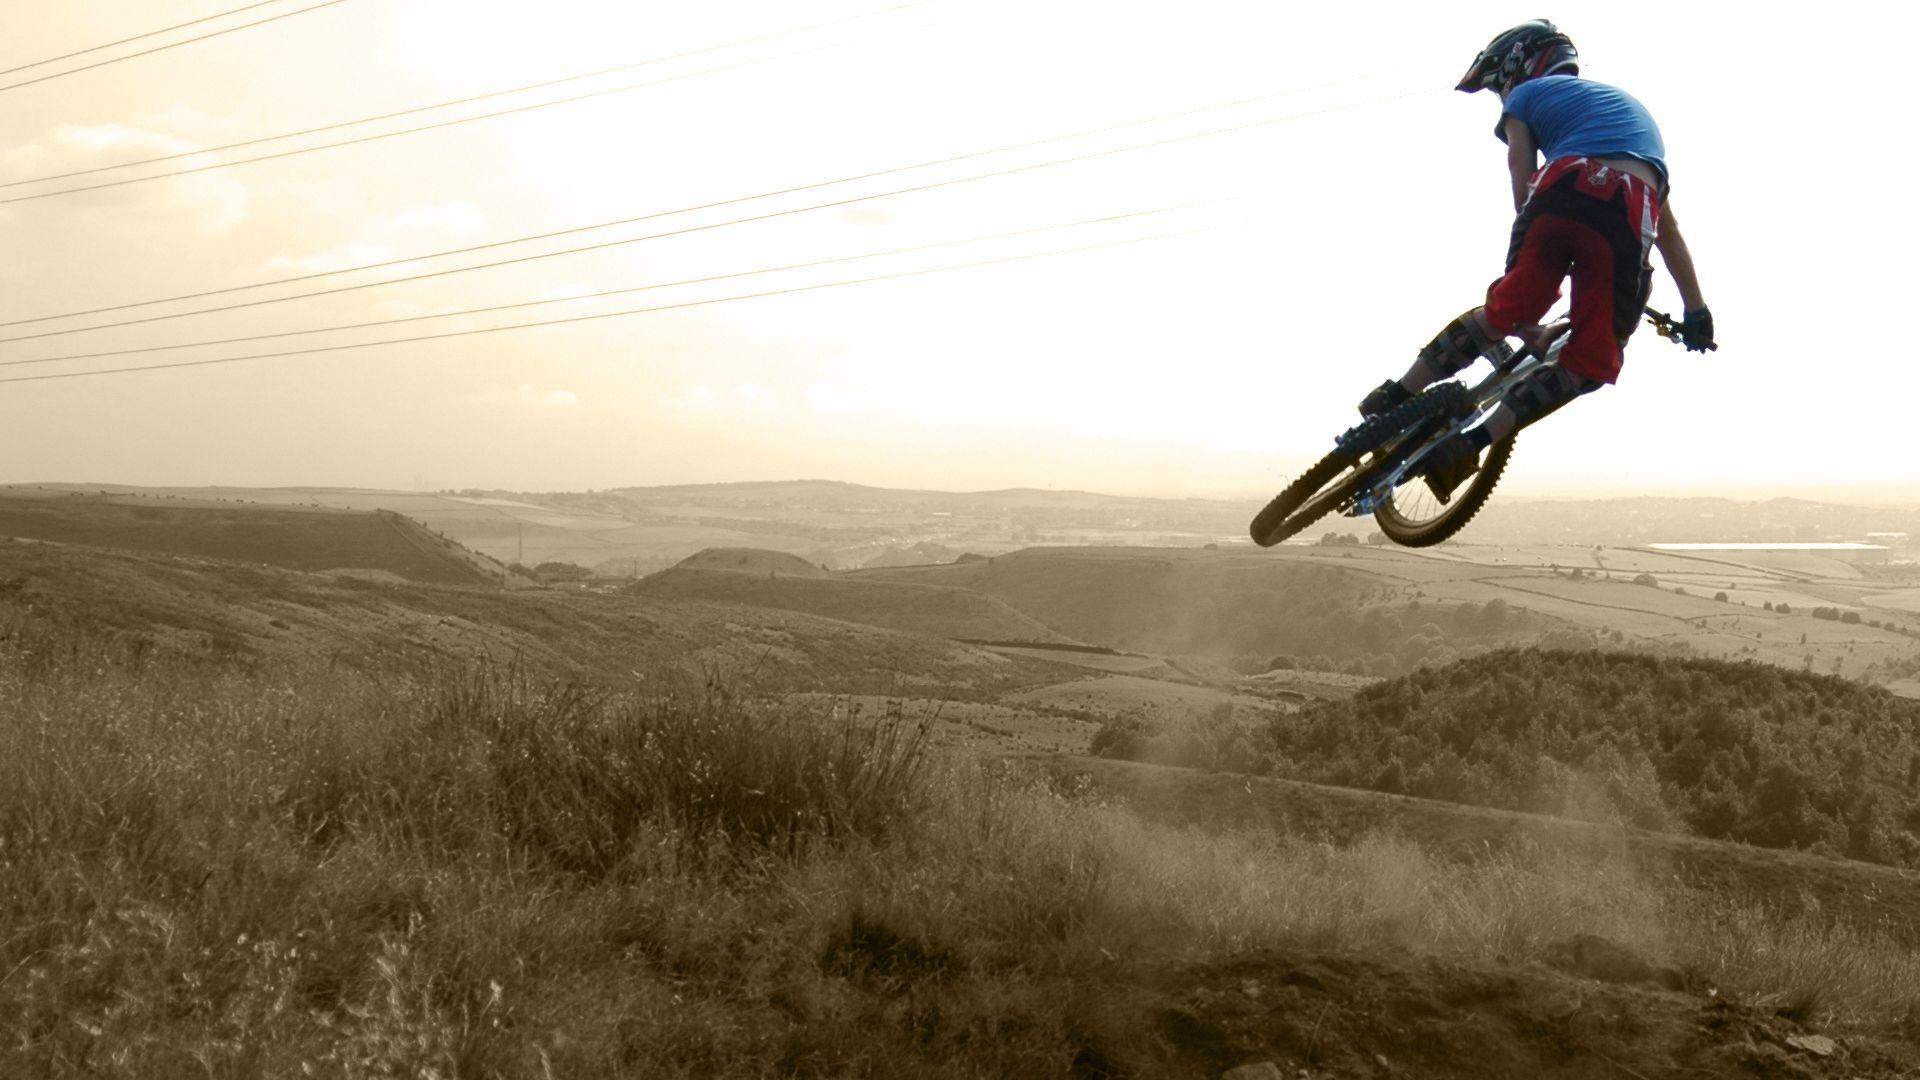 Bmw Mountain View >> Bike Wallpapers High Resolution - WallpaperSafari